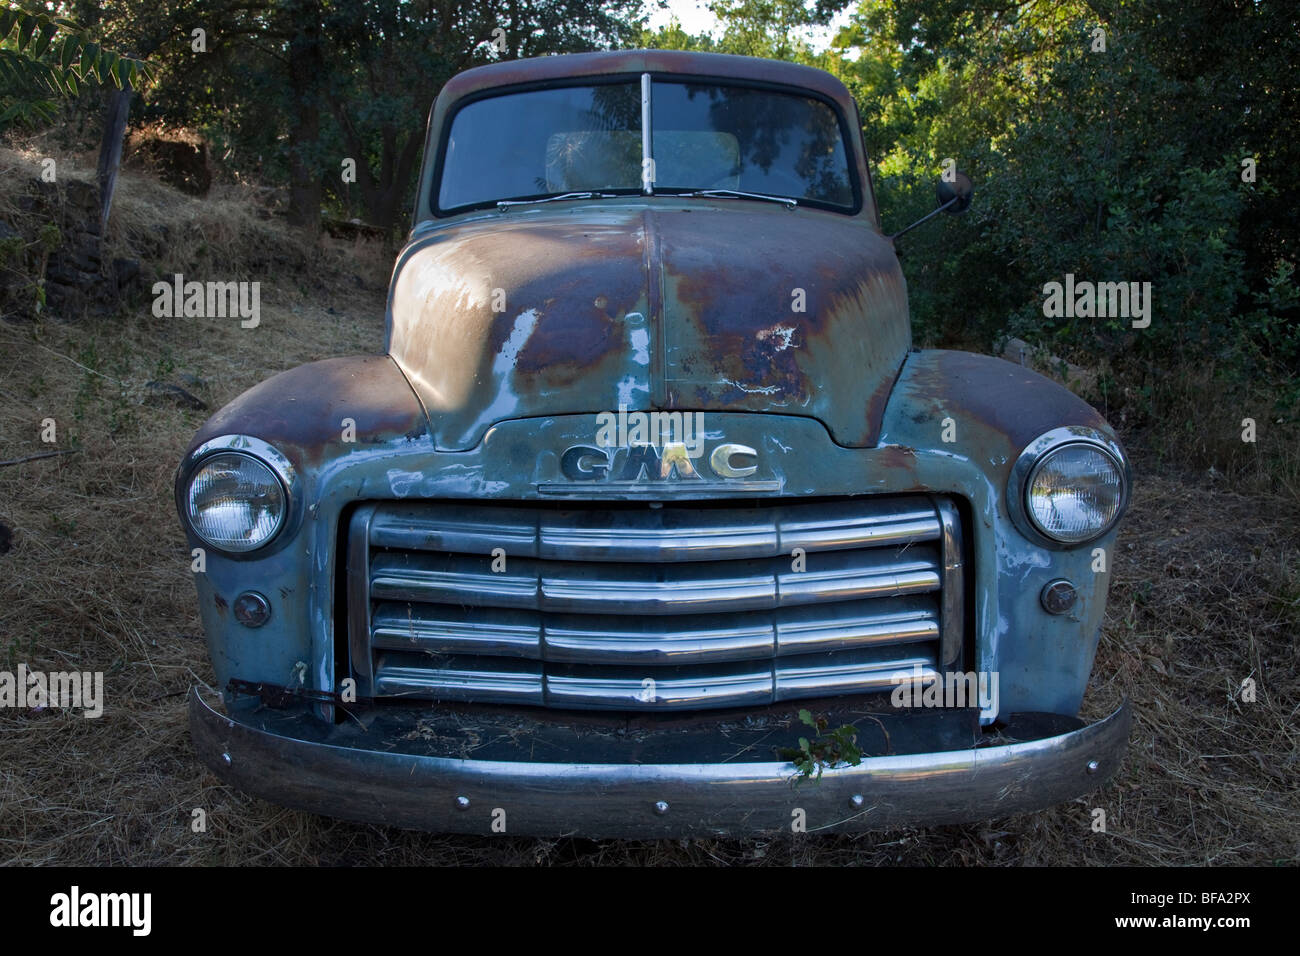 Rusting Early 1950 S Gmc Pickup Truck In A Backyard Stock Photo Alamy